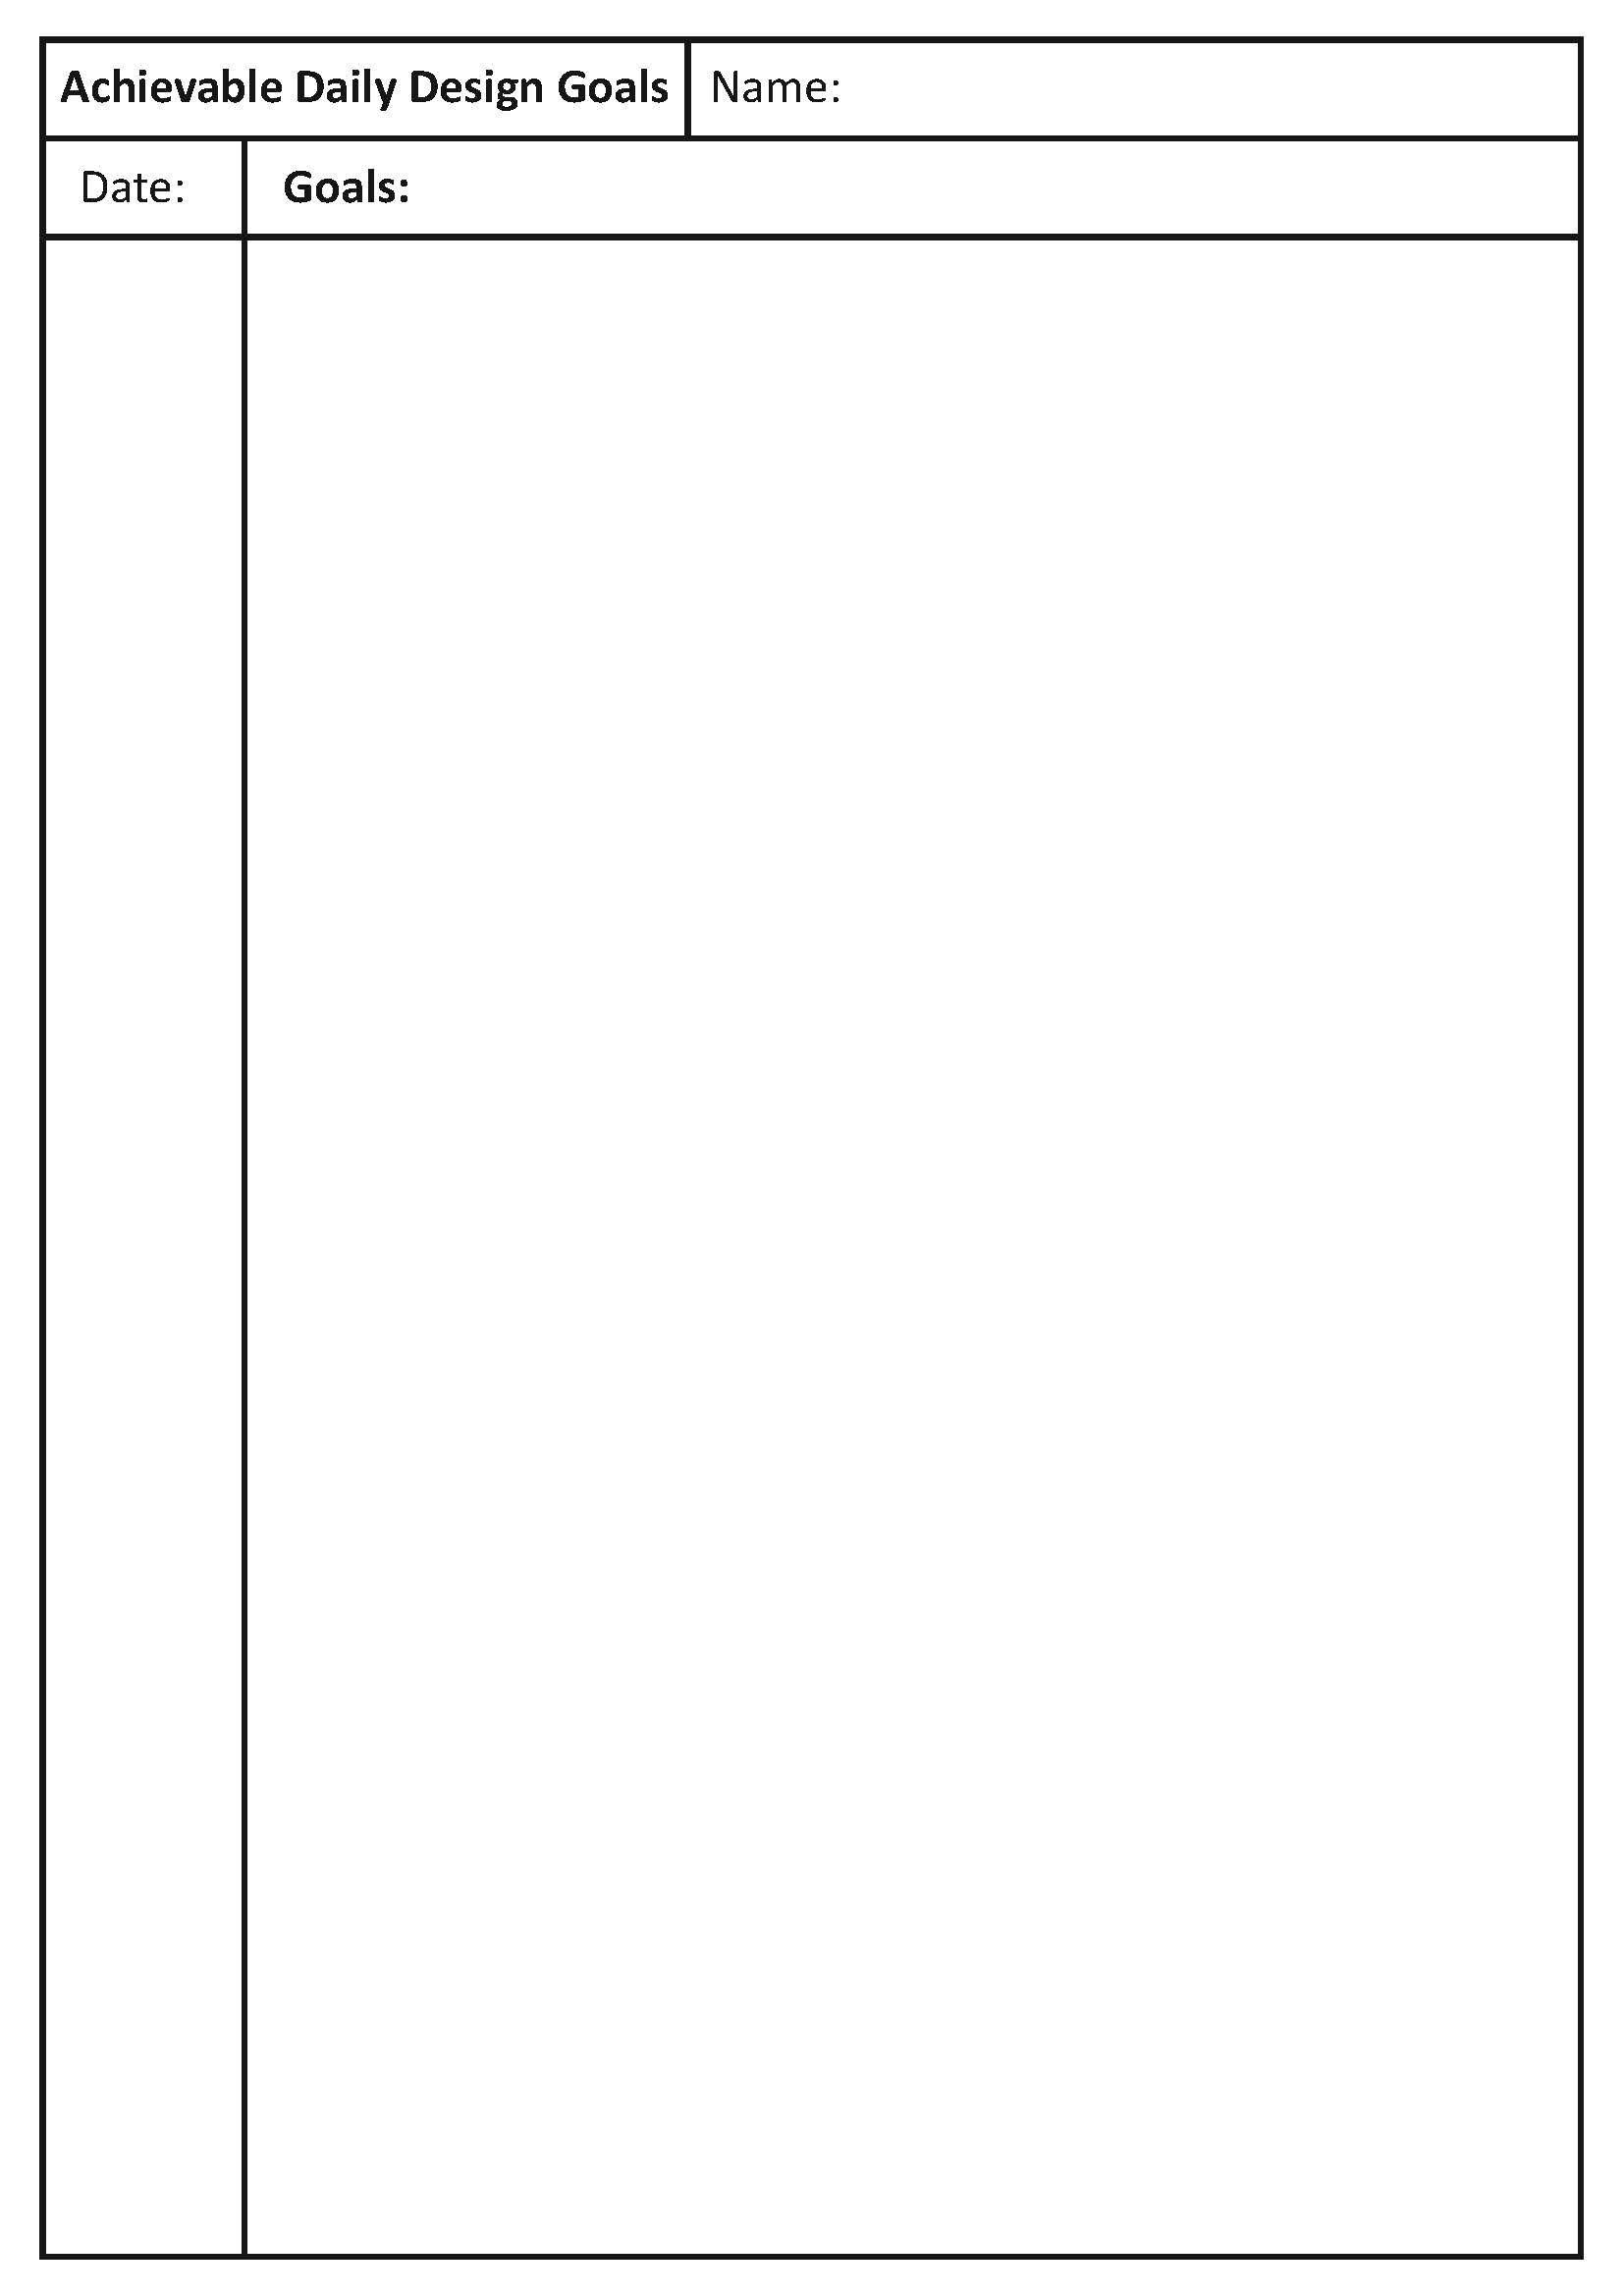 Daily Goals In Any Senior Folio Class